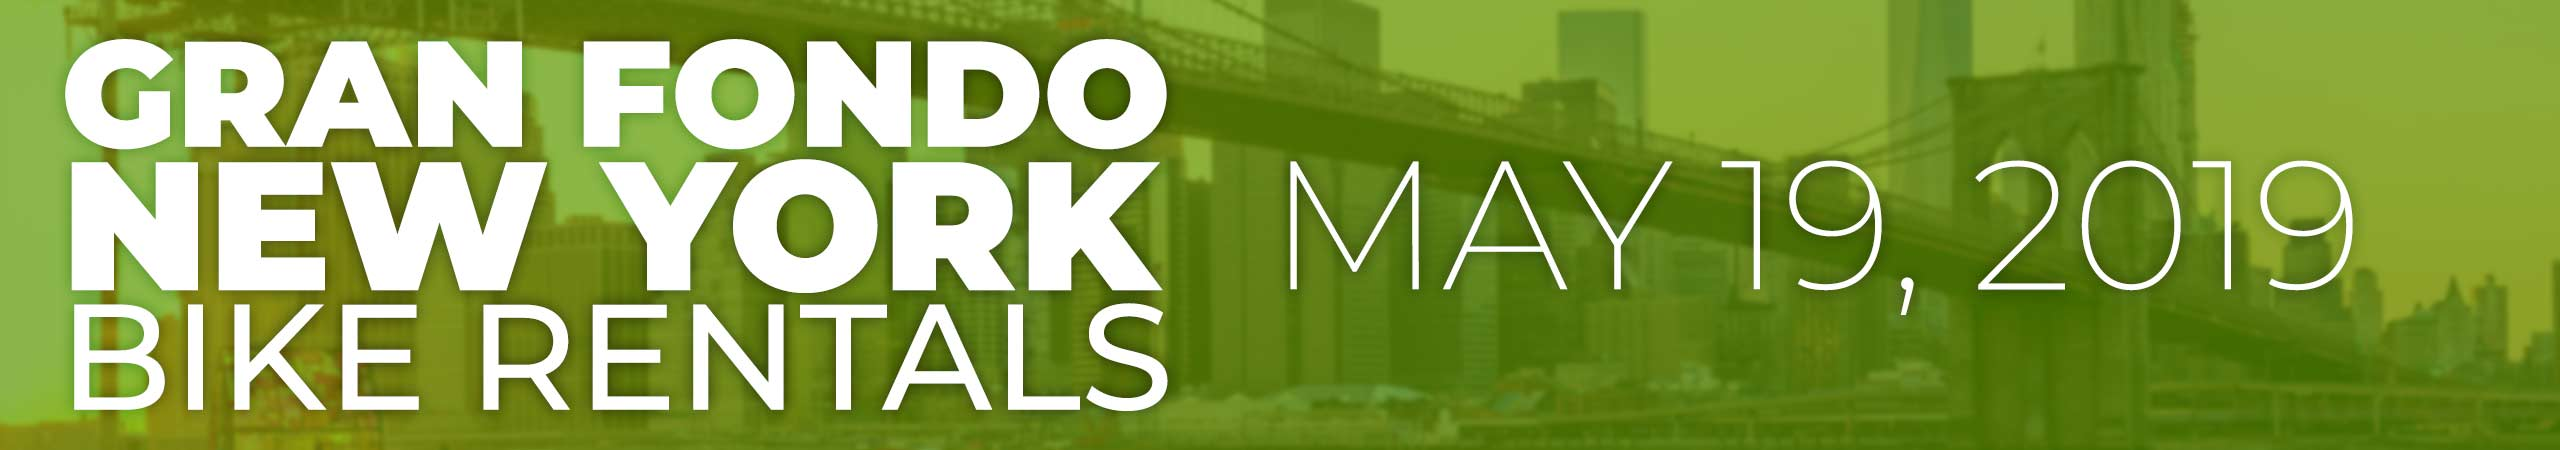 2019 Gran Fondo NY Bike Rentals